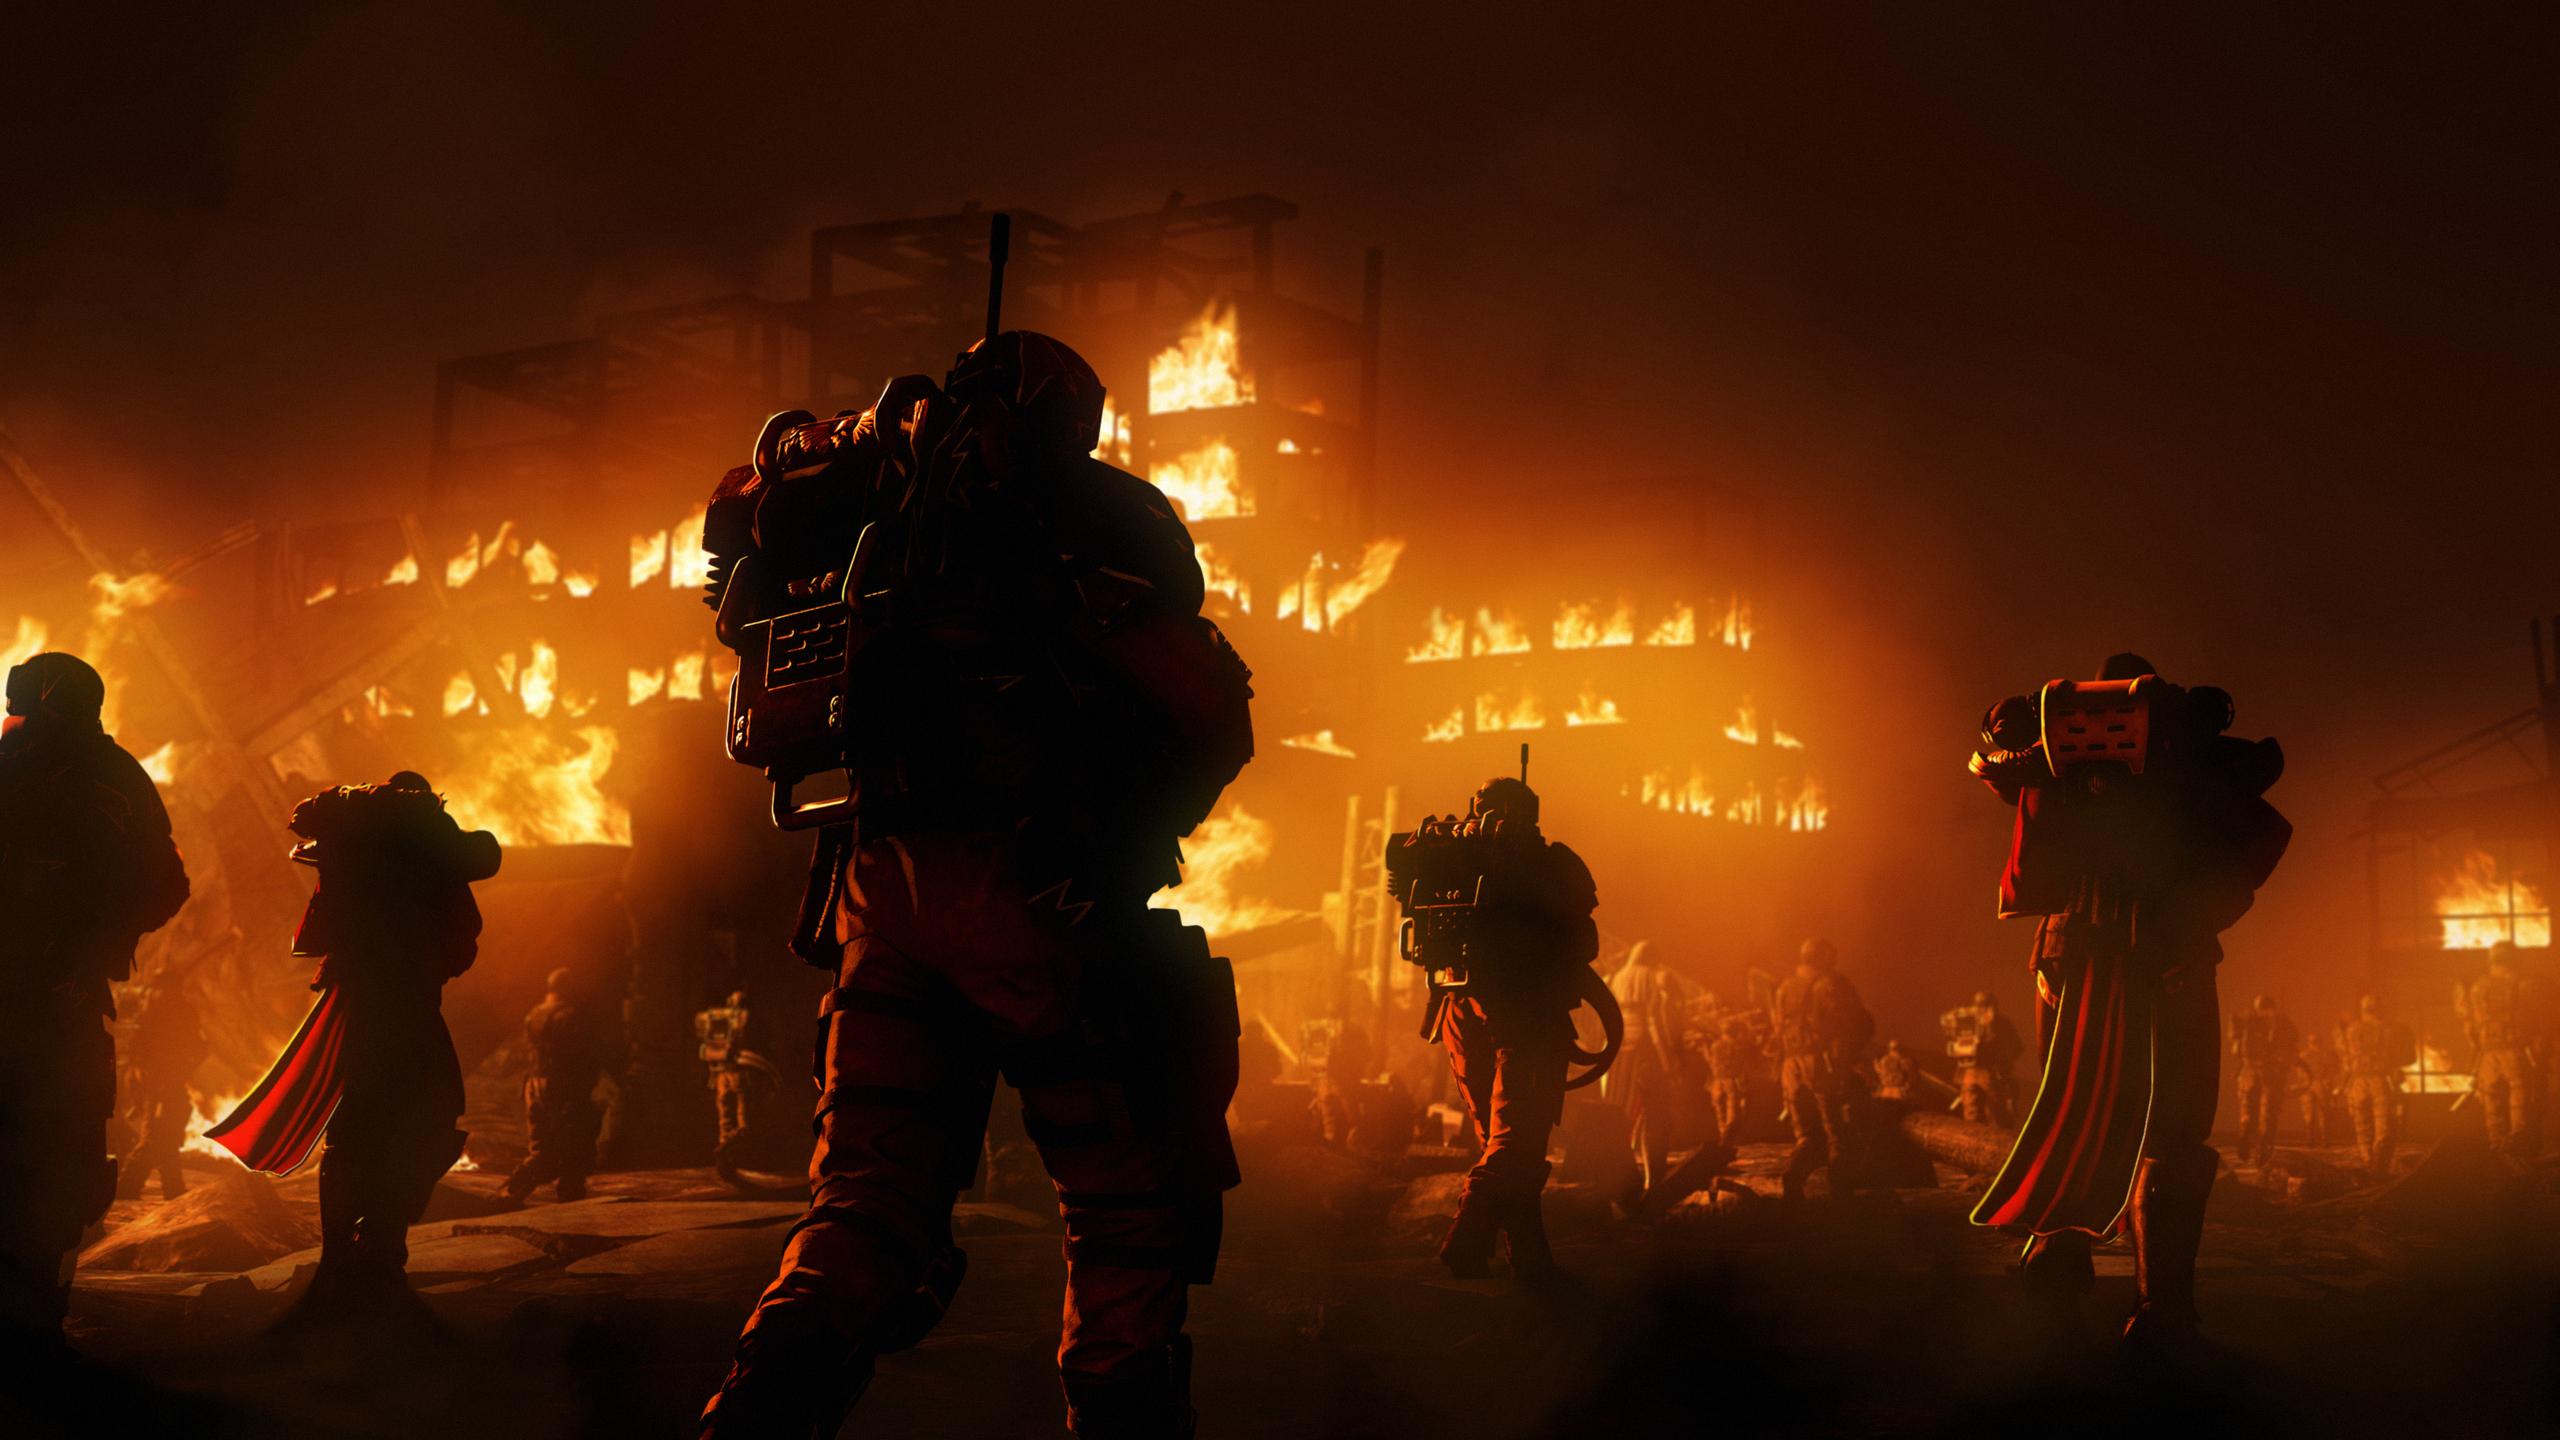 2560x1440 warriros in metal jackets war night fire 1440p resolution